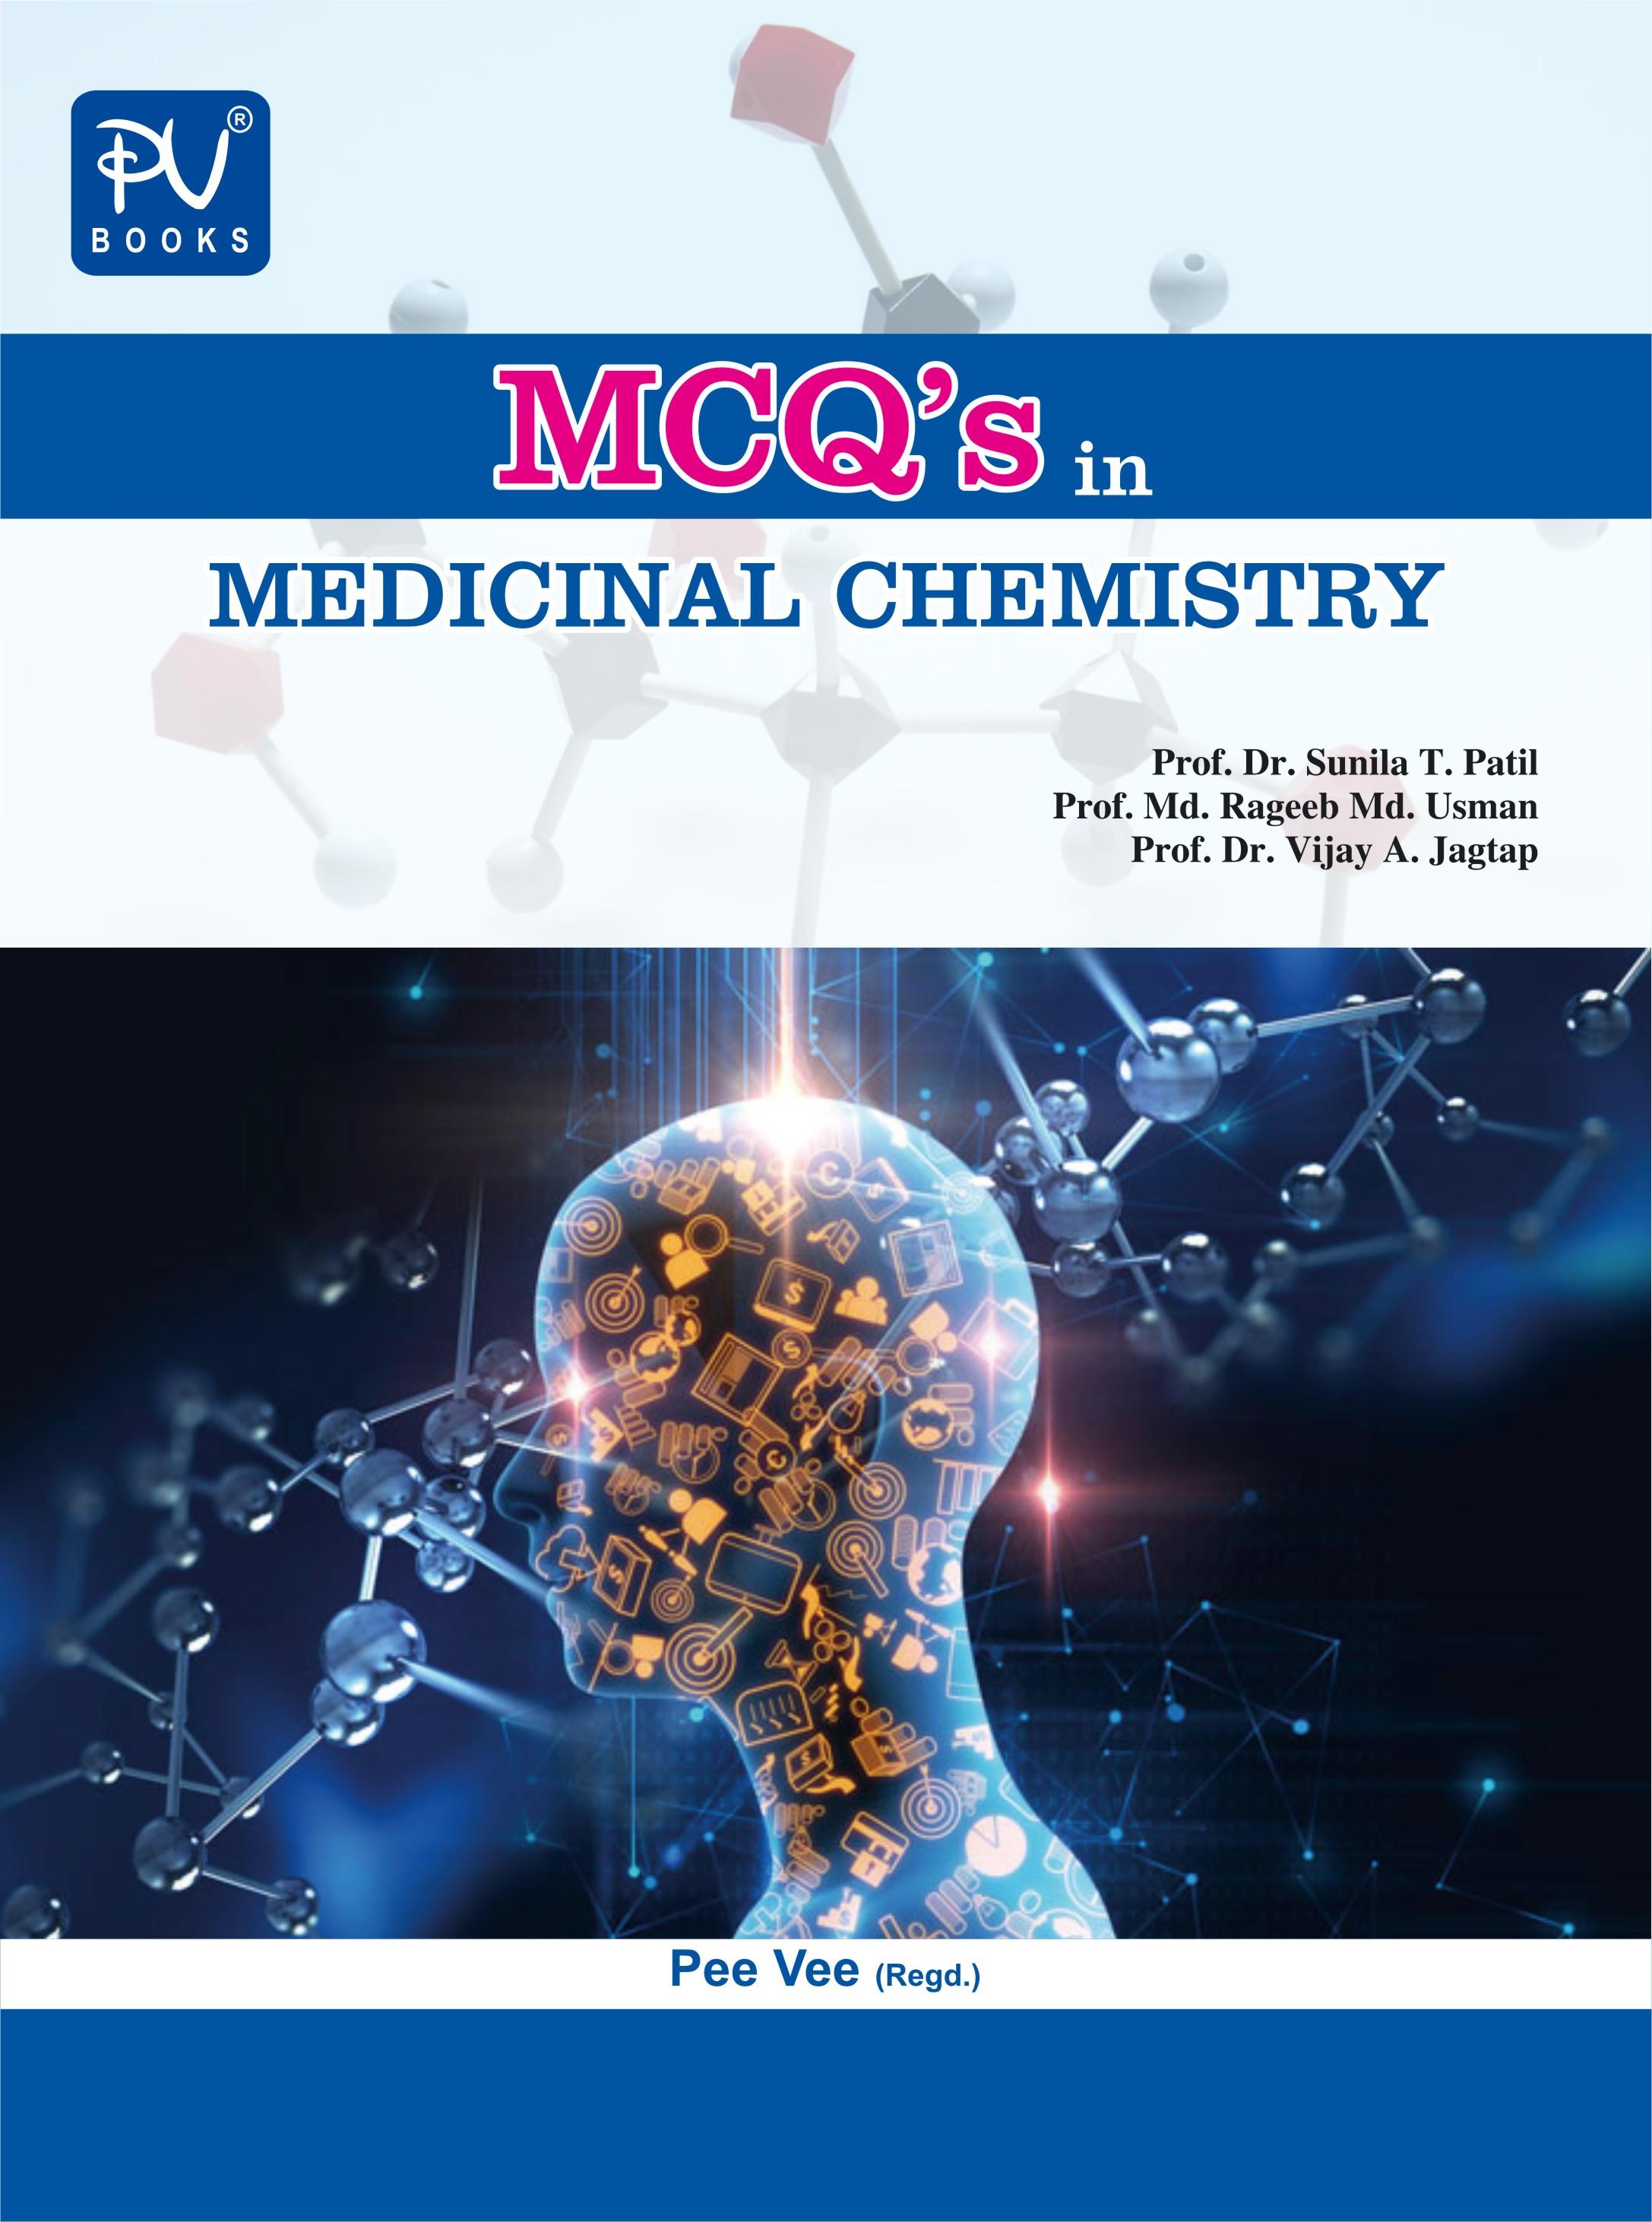 MCQS IN MEDICINAL CHEMISTRY